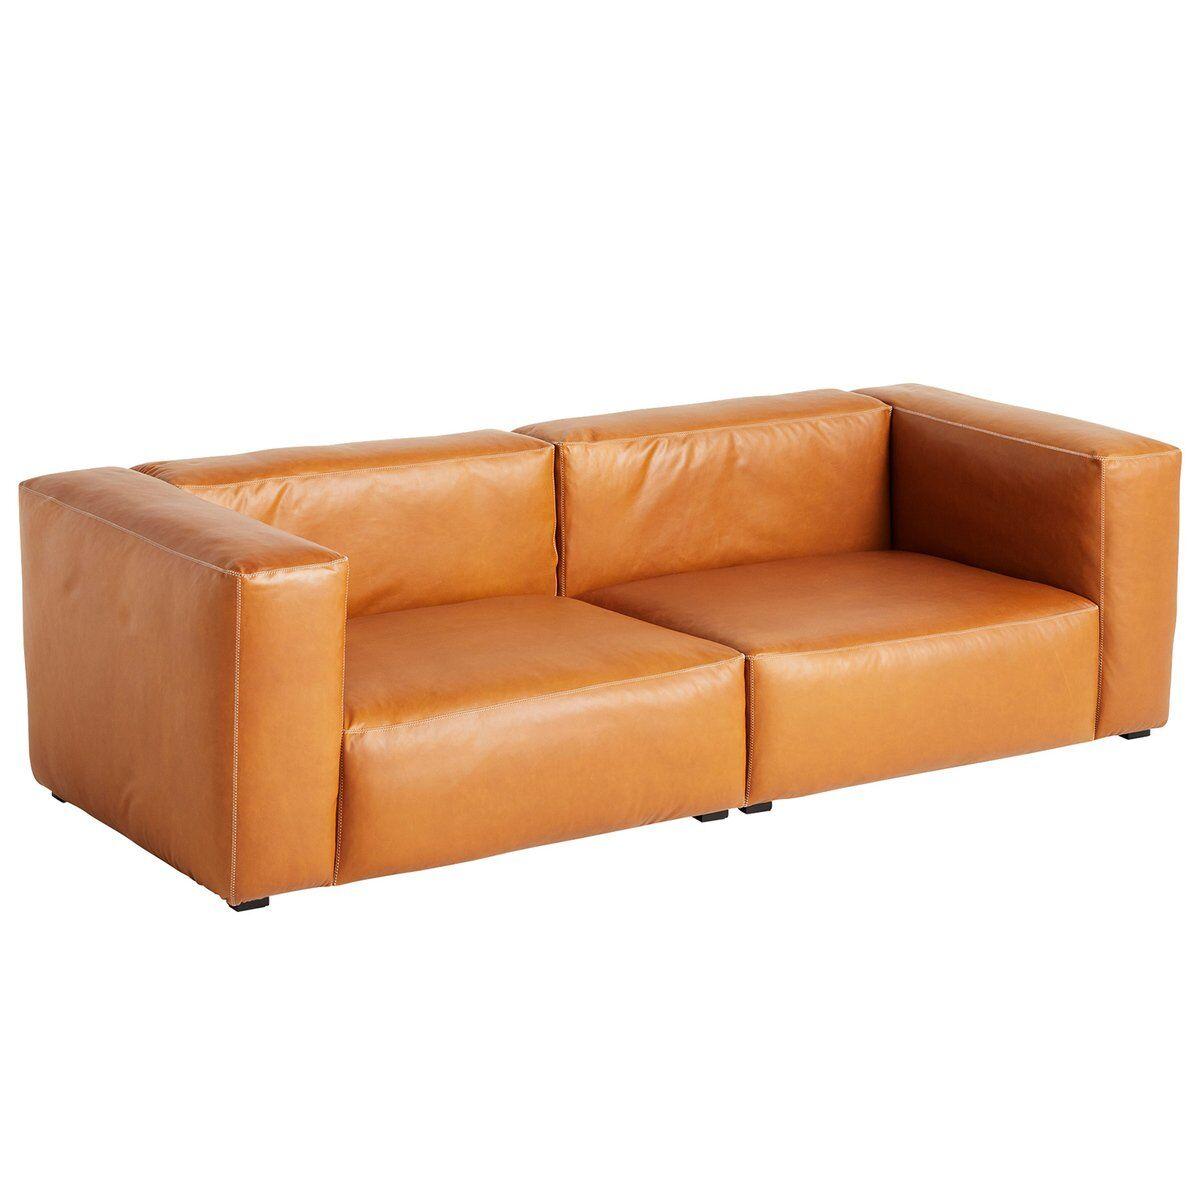 Hay Mags Soft sohva 2,5-ist/228 cm, korkea k�sinoja, Silk 0250